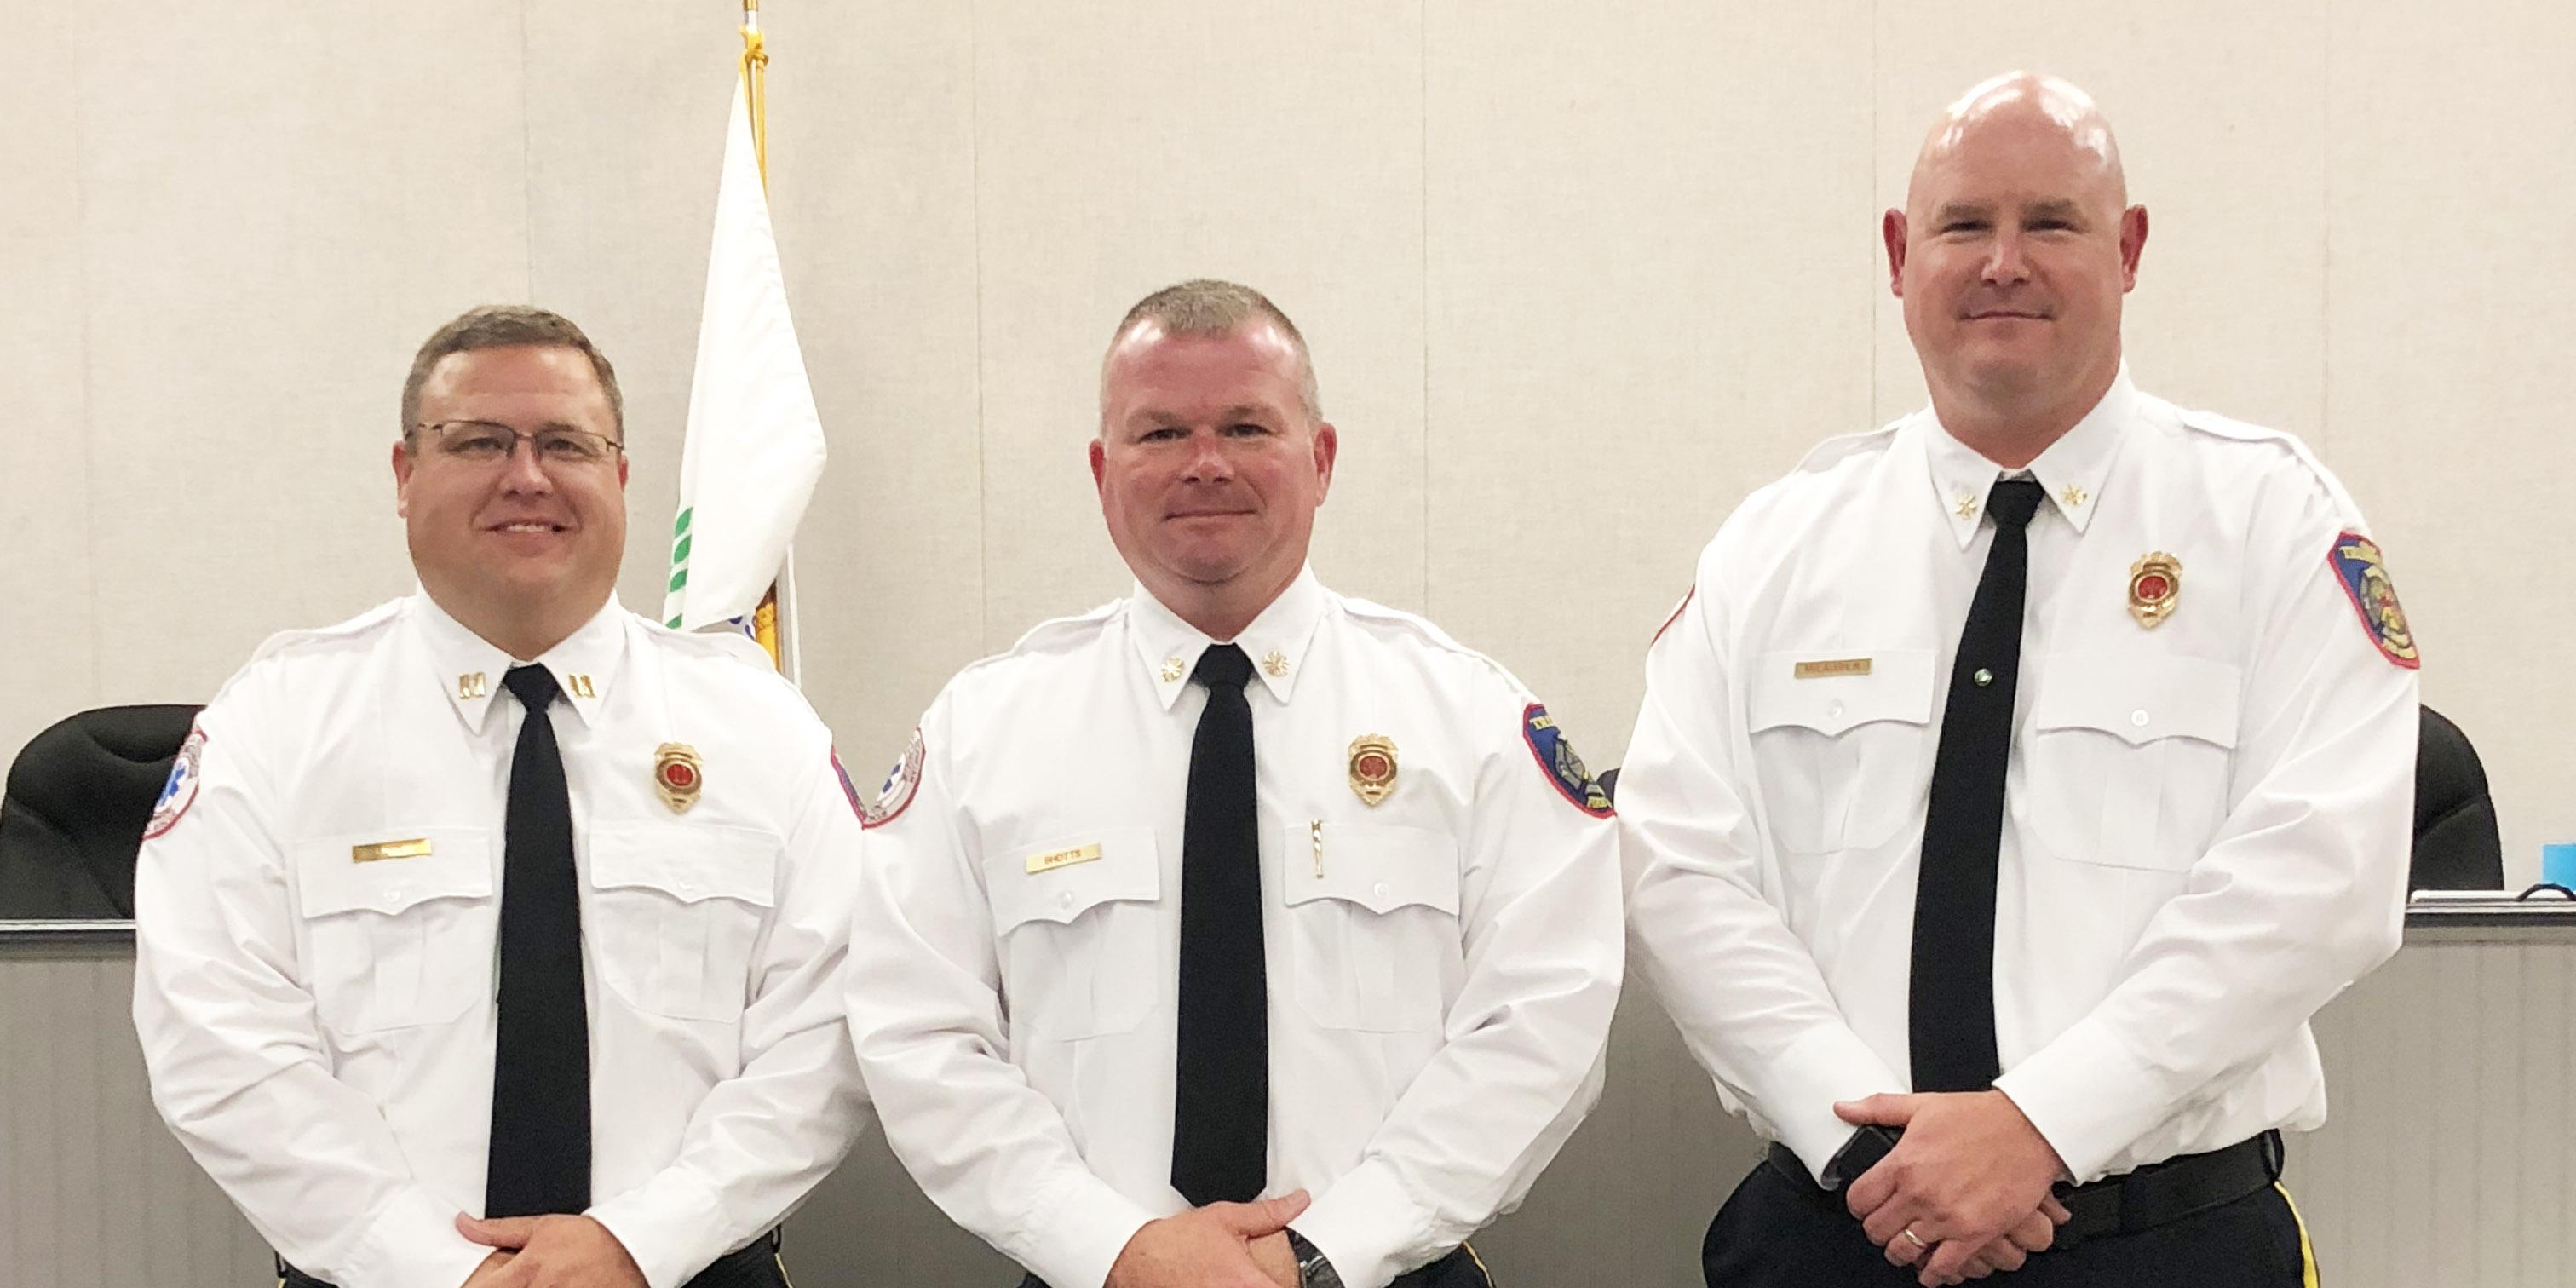 Trussville City Council names two assistant fire chiefs